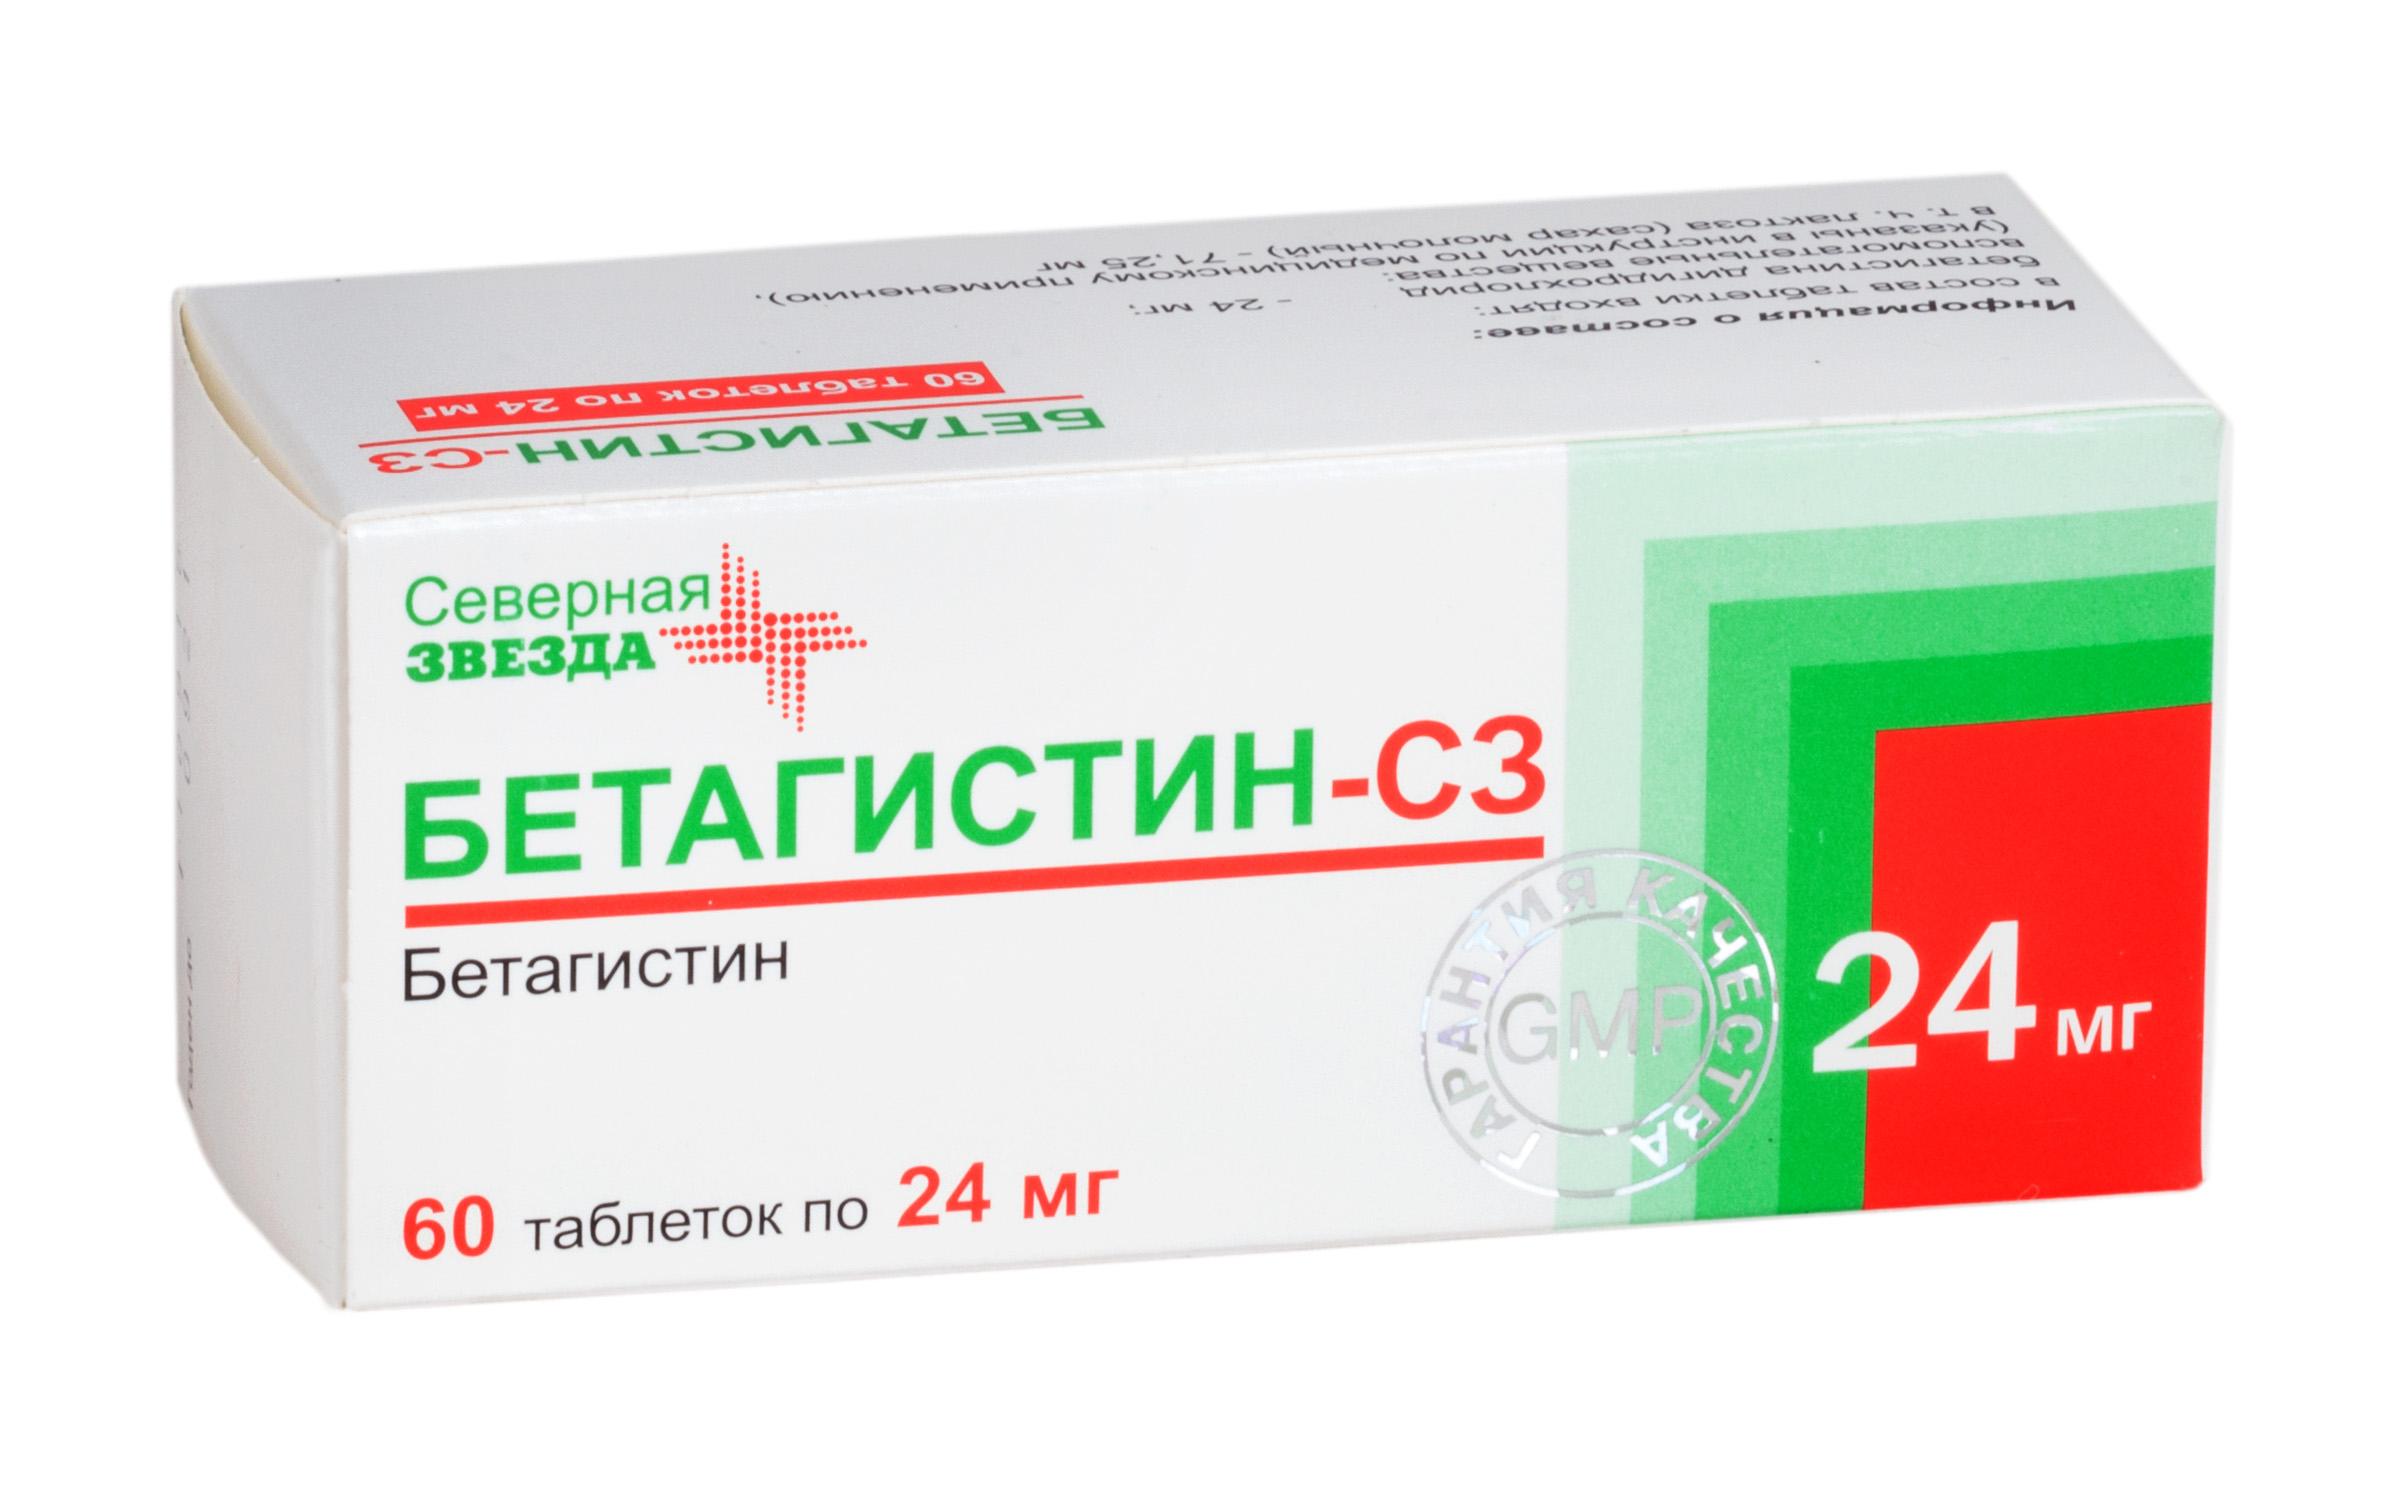 Бетагистин таблетки 24мг №60 Северная звезда